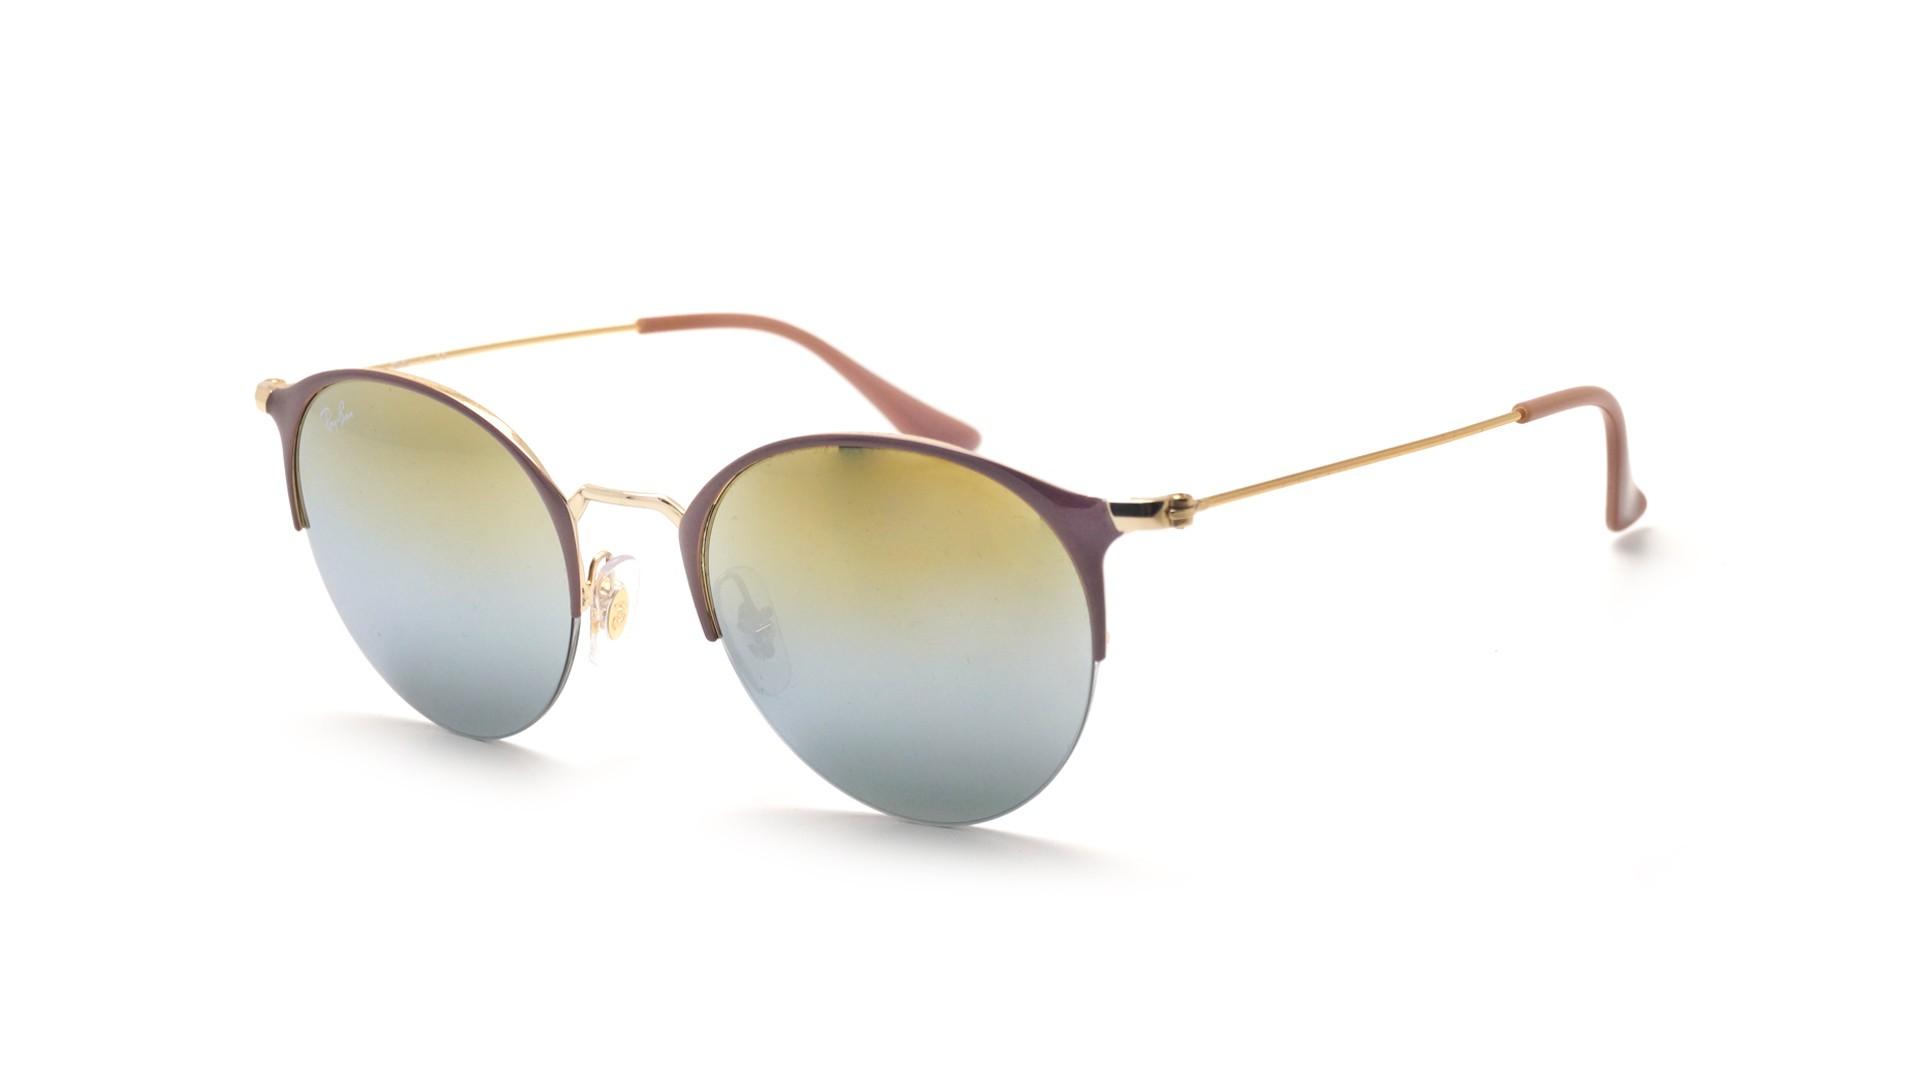 58327088f73 Sunglasses Ray-Ban RB3578 9011A7 50-22 Purple Medium Mirror